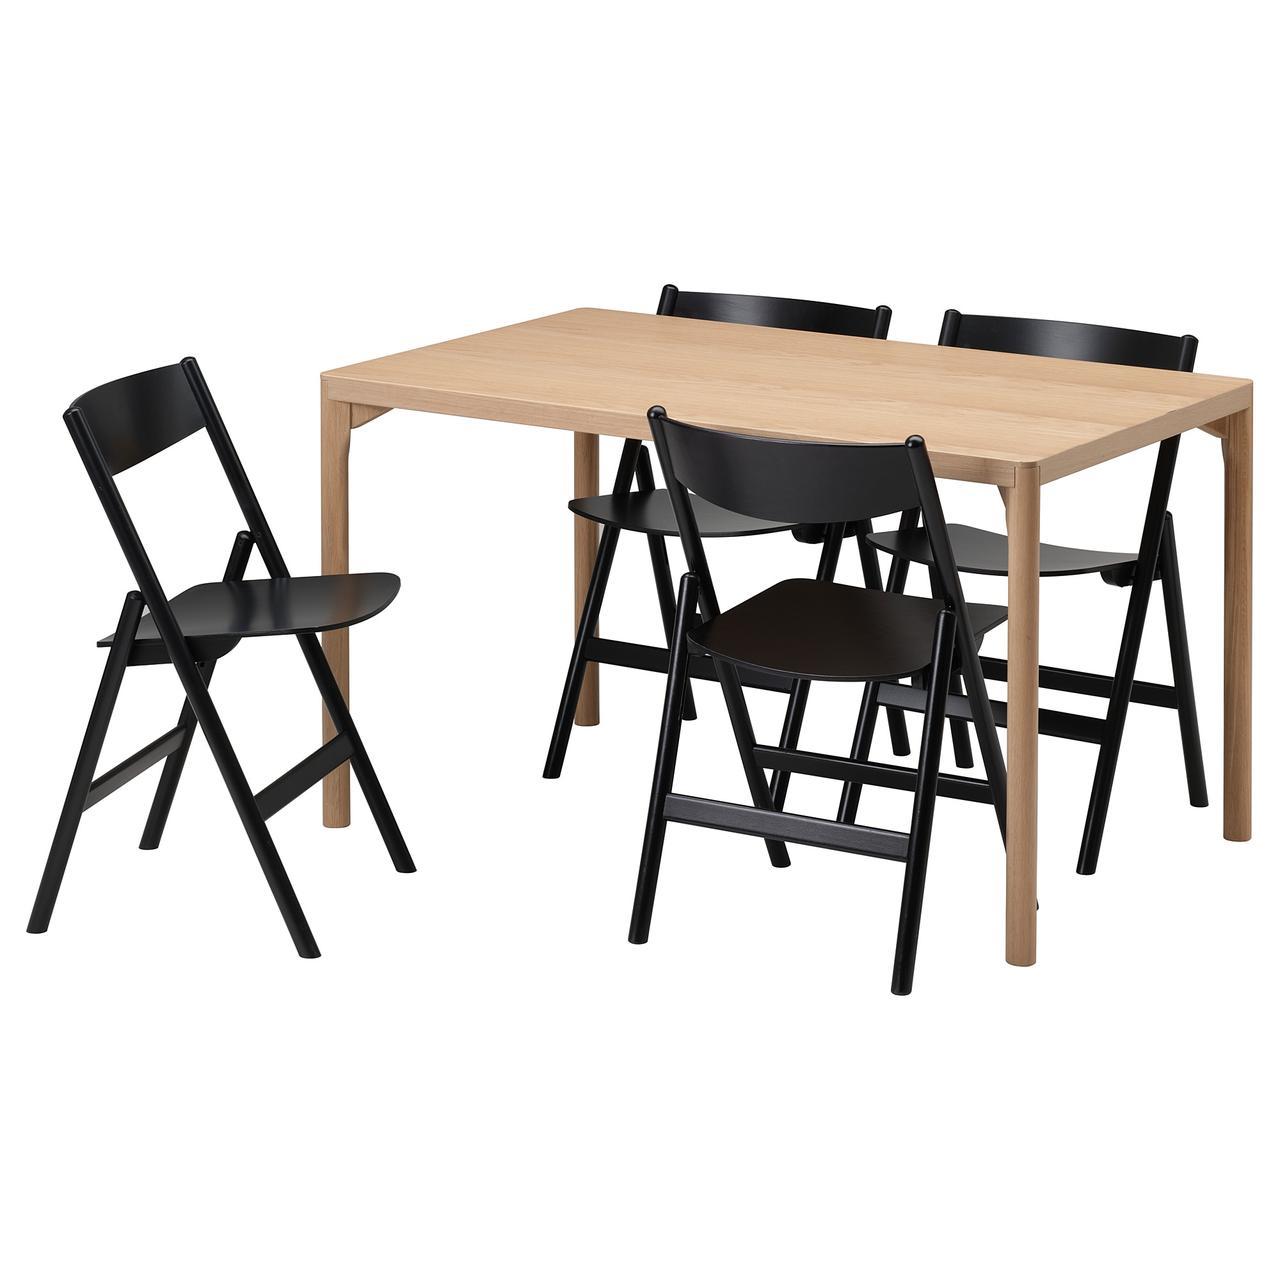 IKEA RÅVAROR Стол и 4 стула, 130x78 см